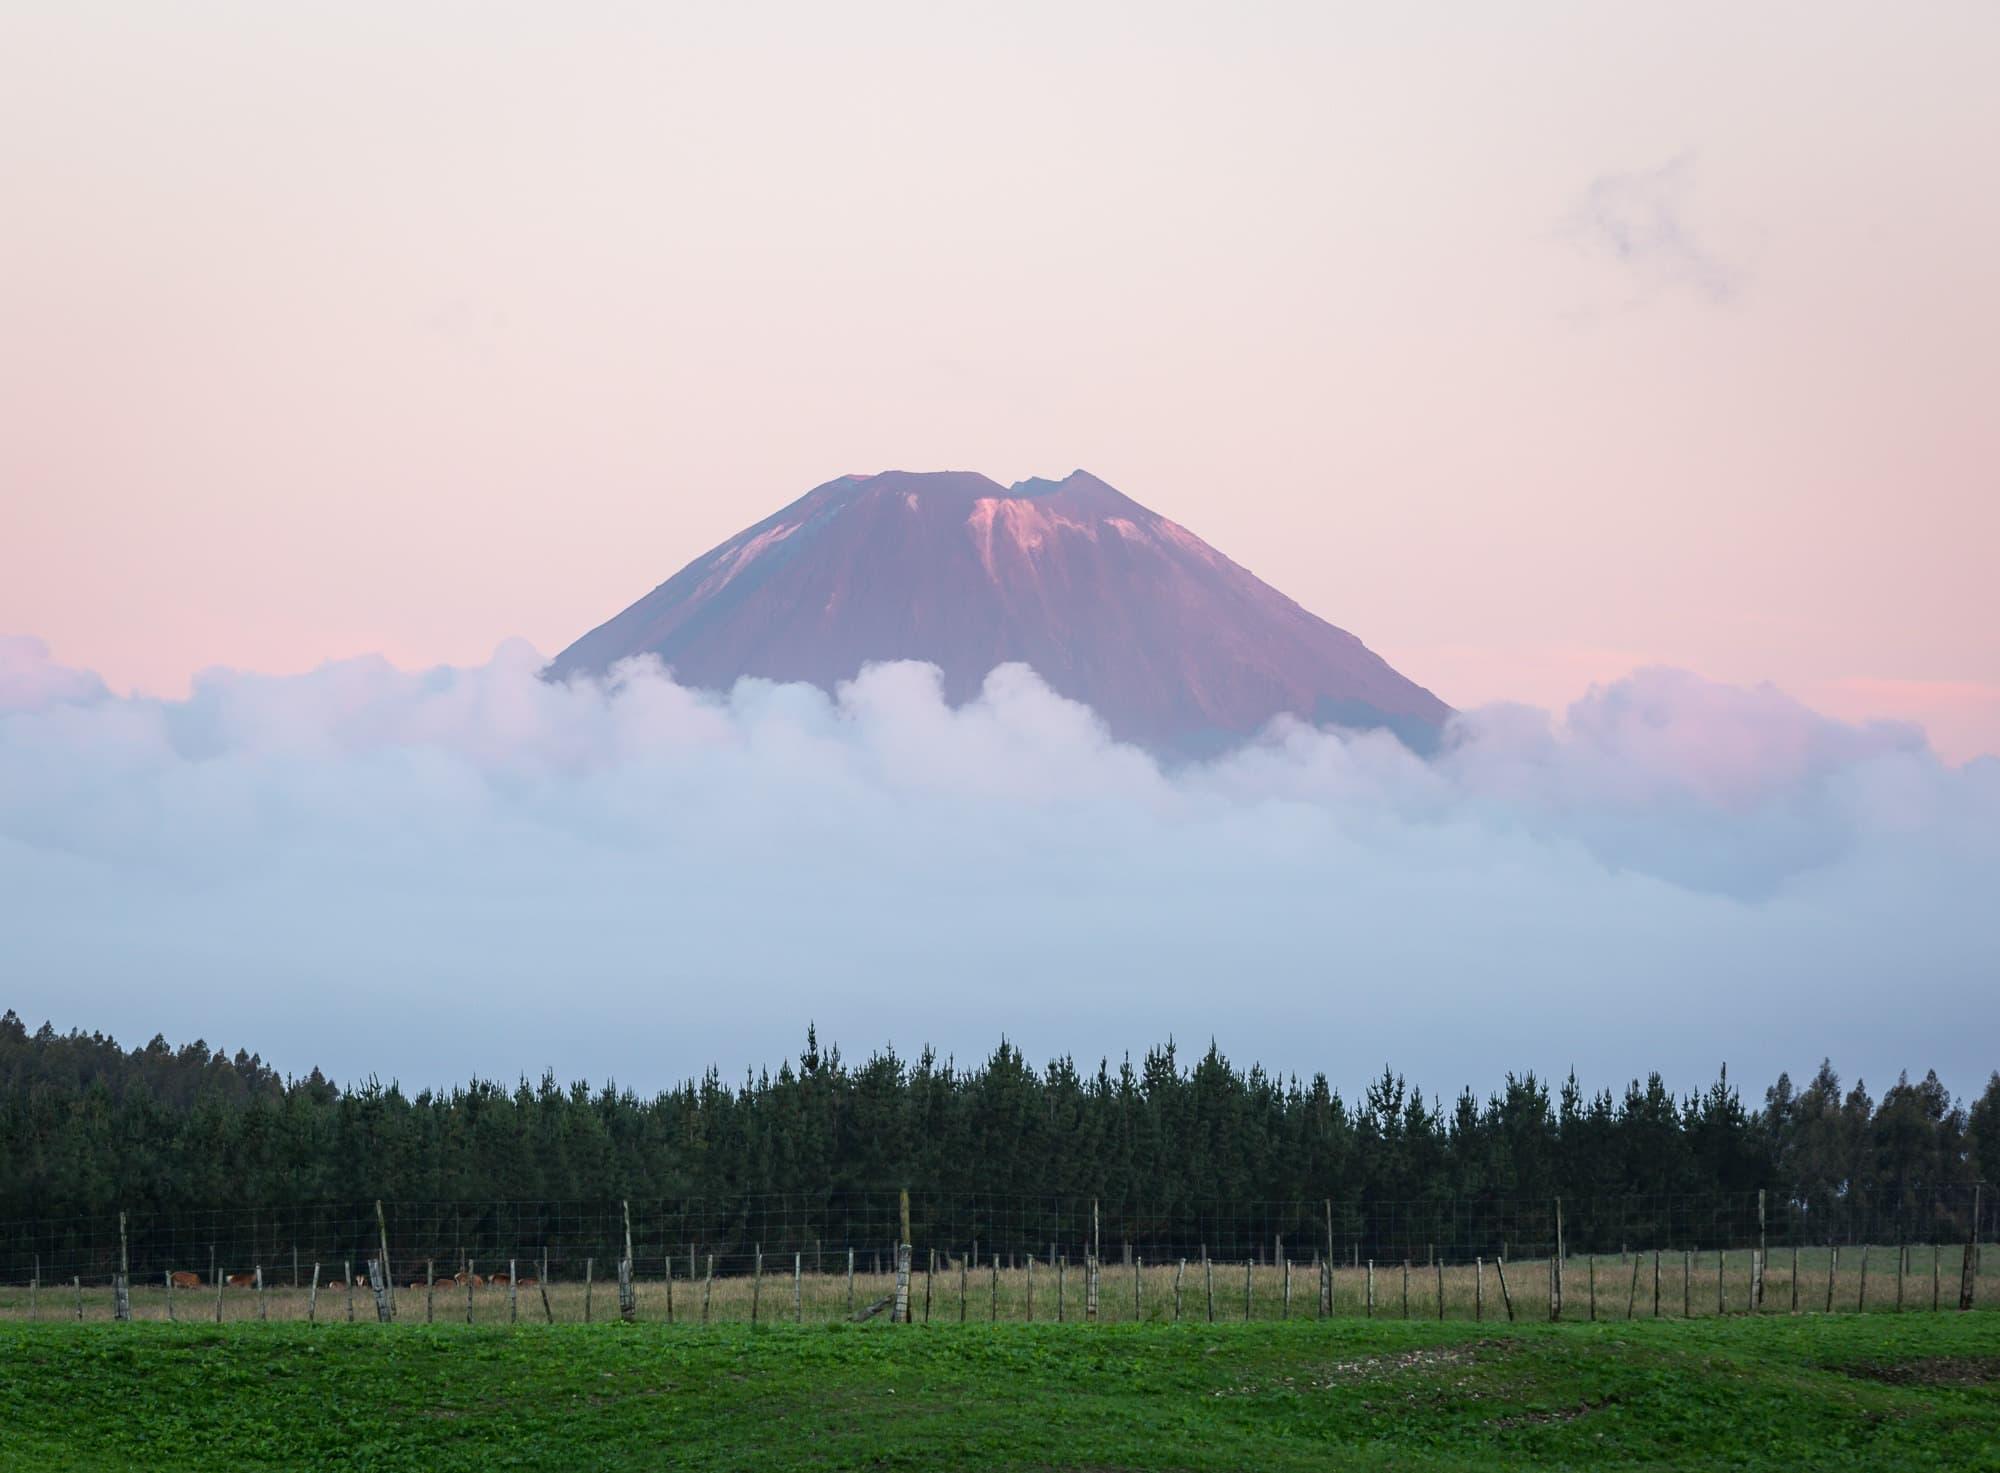 mountain image tongariro new zealand